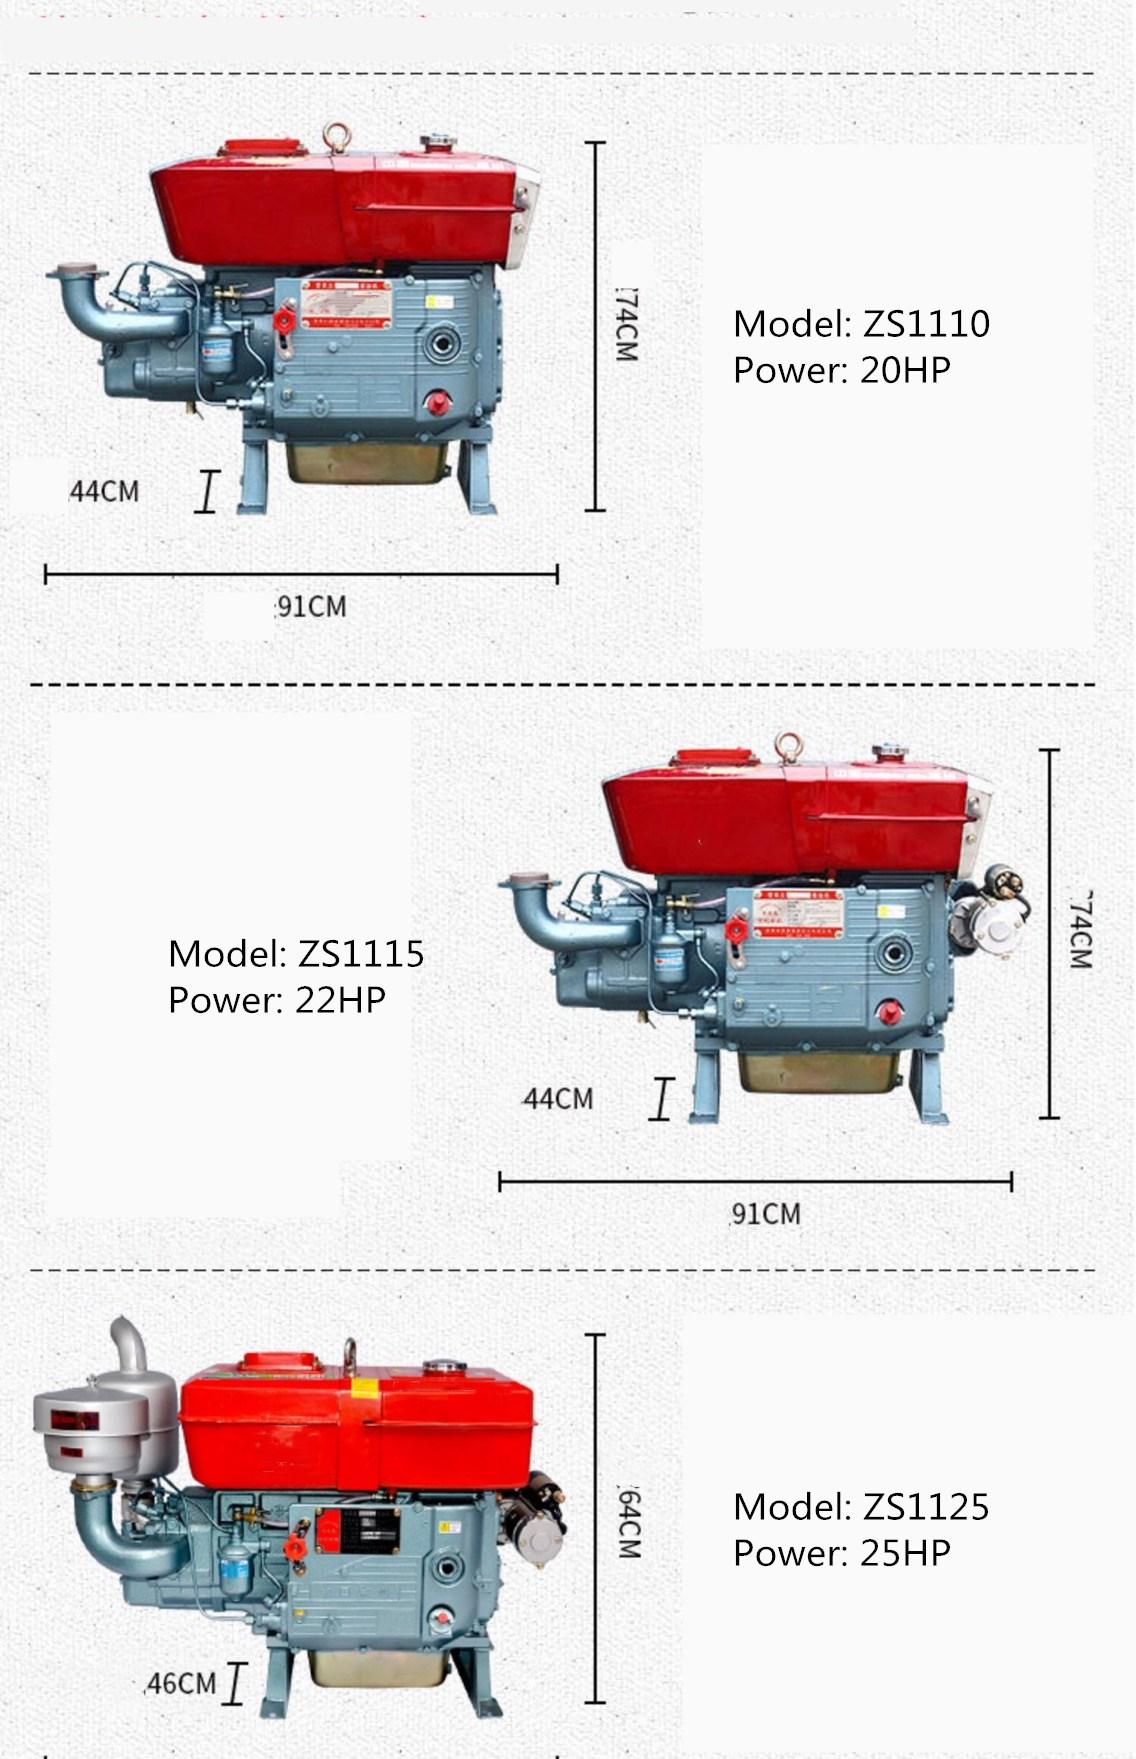 Agricultural diesel engine water cooling diesel engine single-cylinder hand crank electric start diesel engine